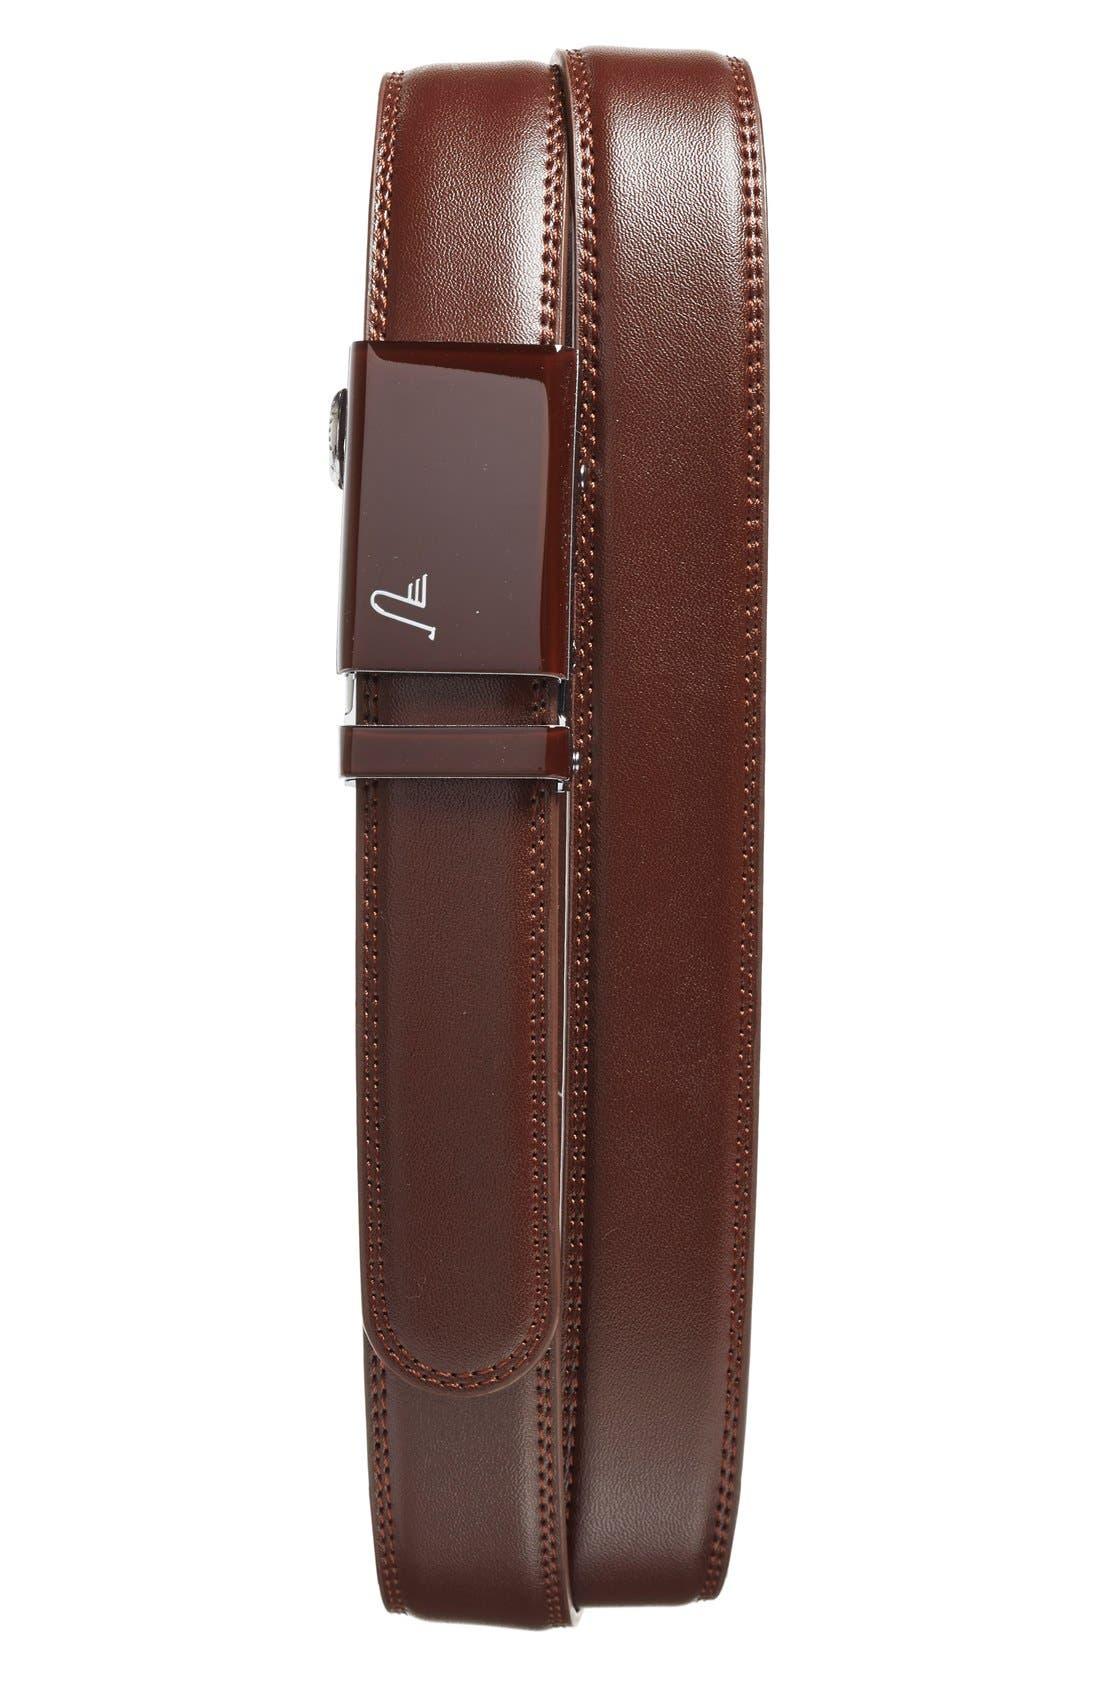 Alternate Image 1 Selected - Mission Belt 'Chocolate' Leather Belt